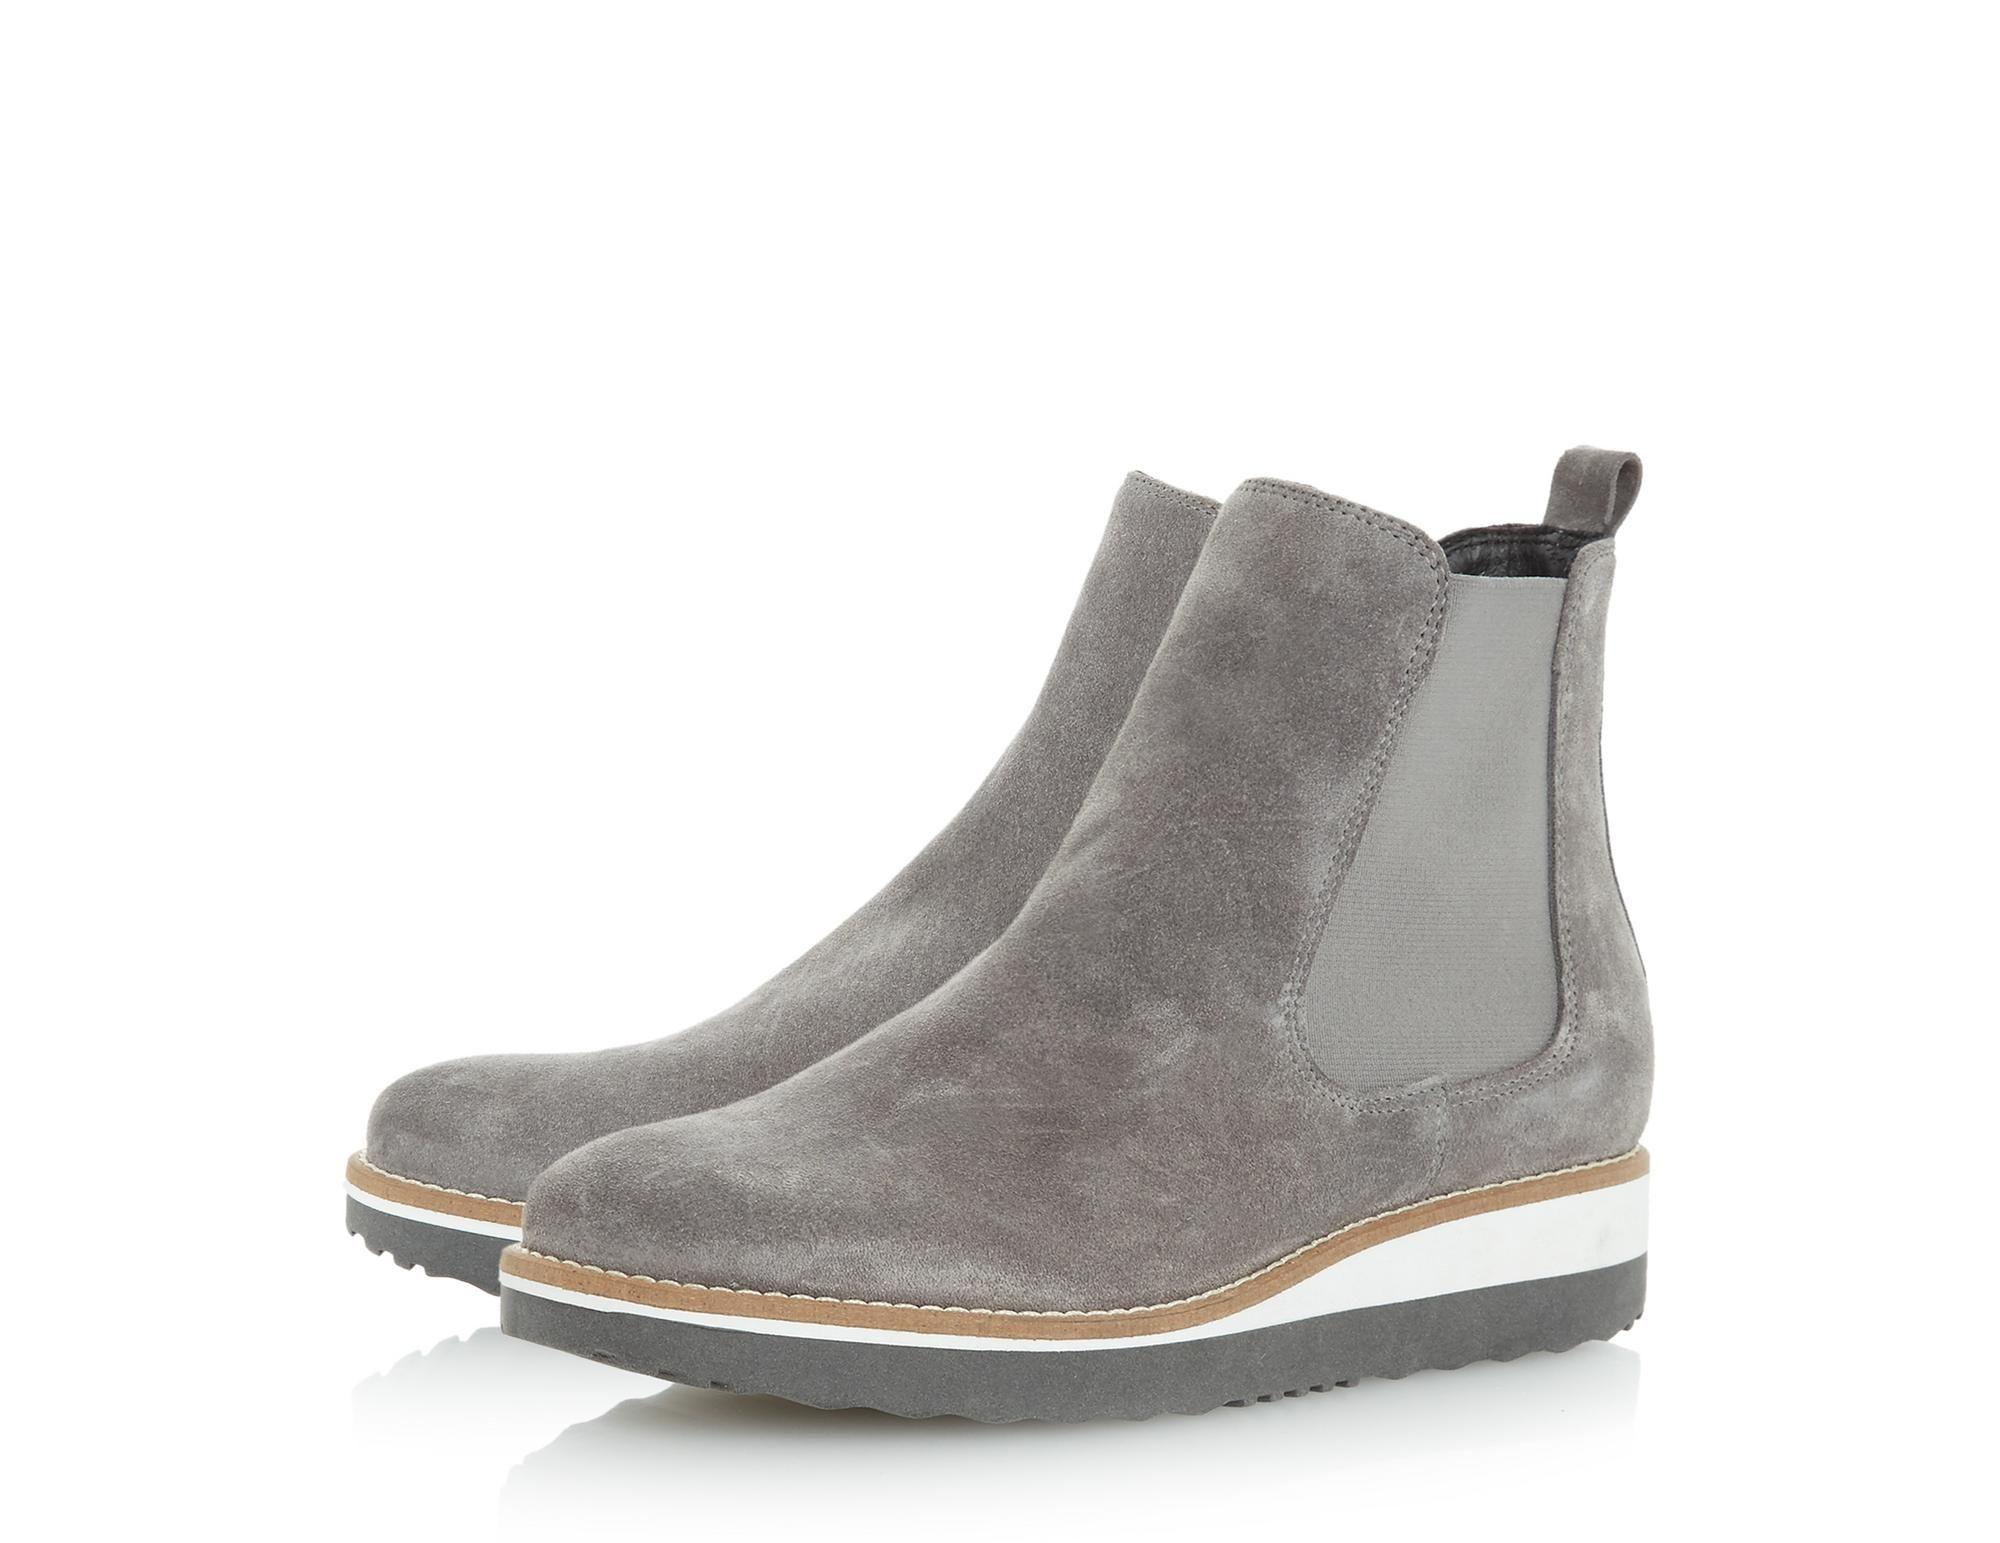 PONTOW - Flatform Chelsea Ankle Boot - grey   Dune London